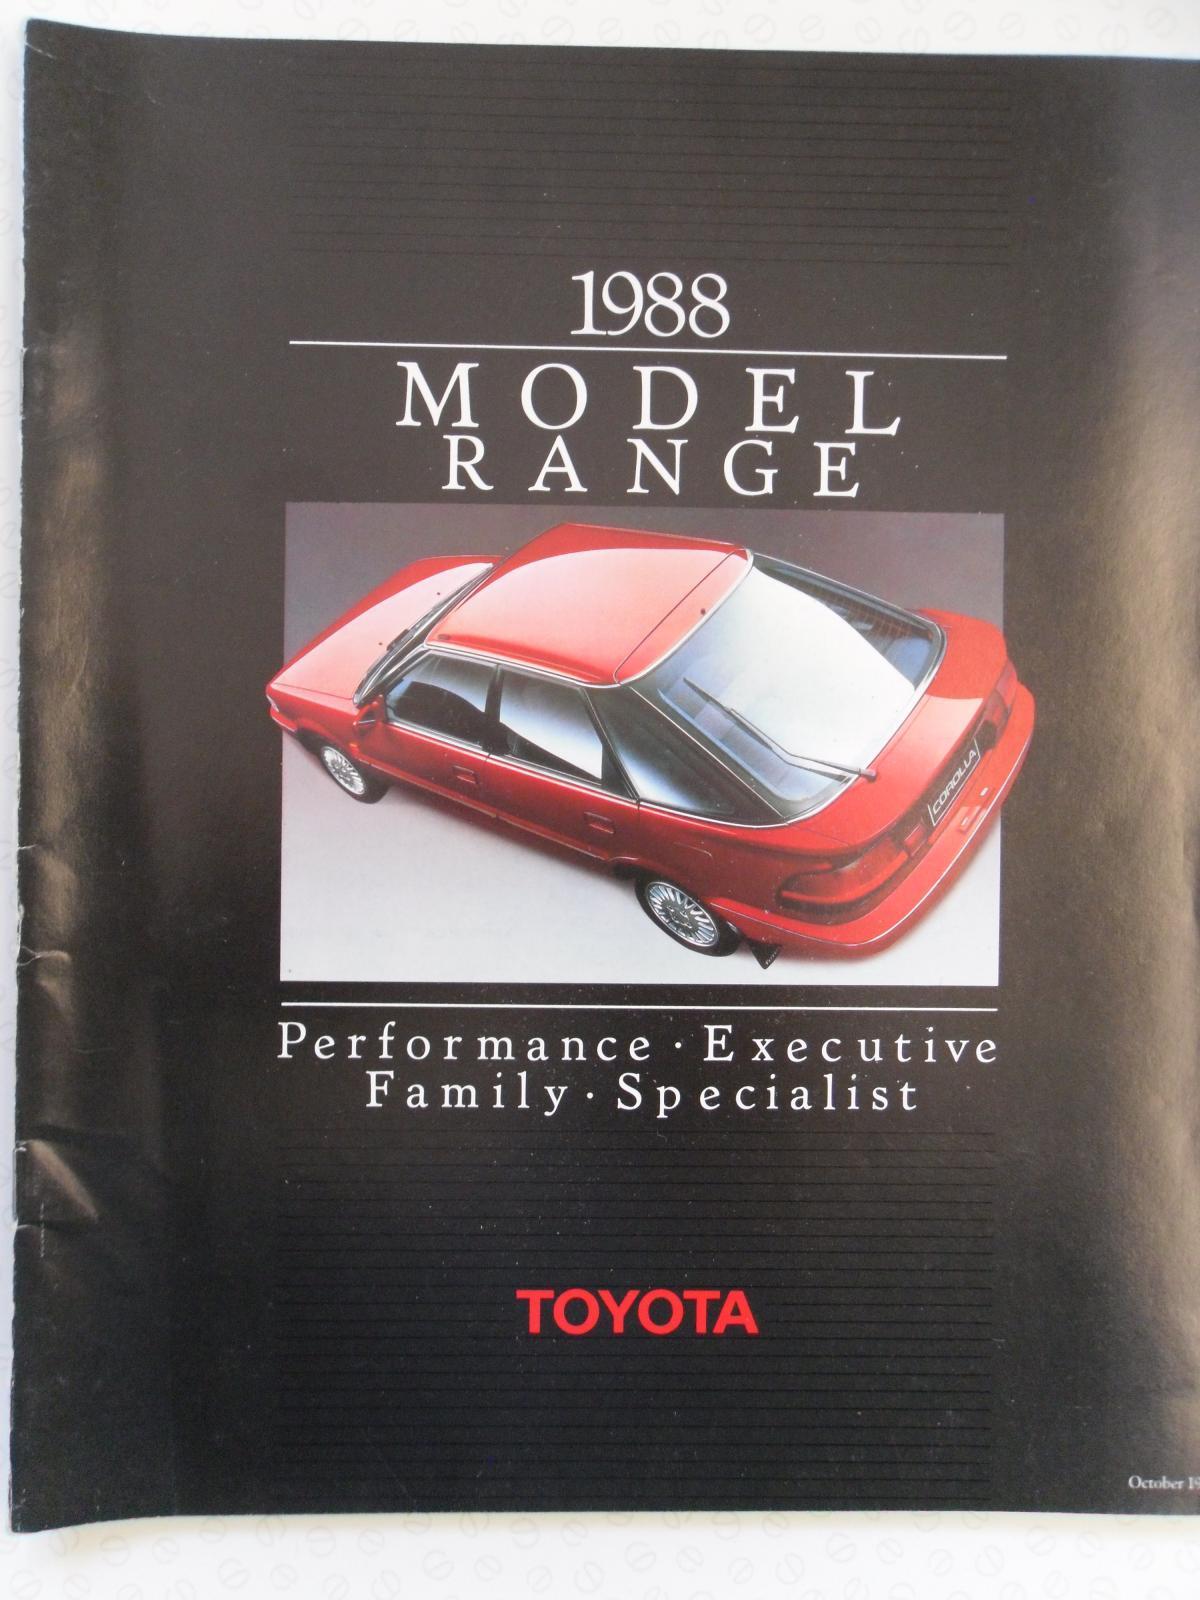 Toyota Honda 007.JPG